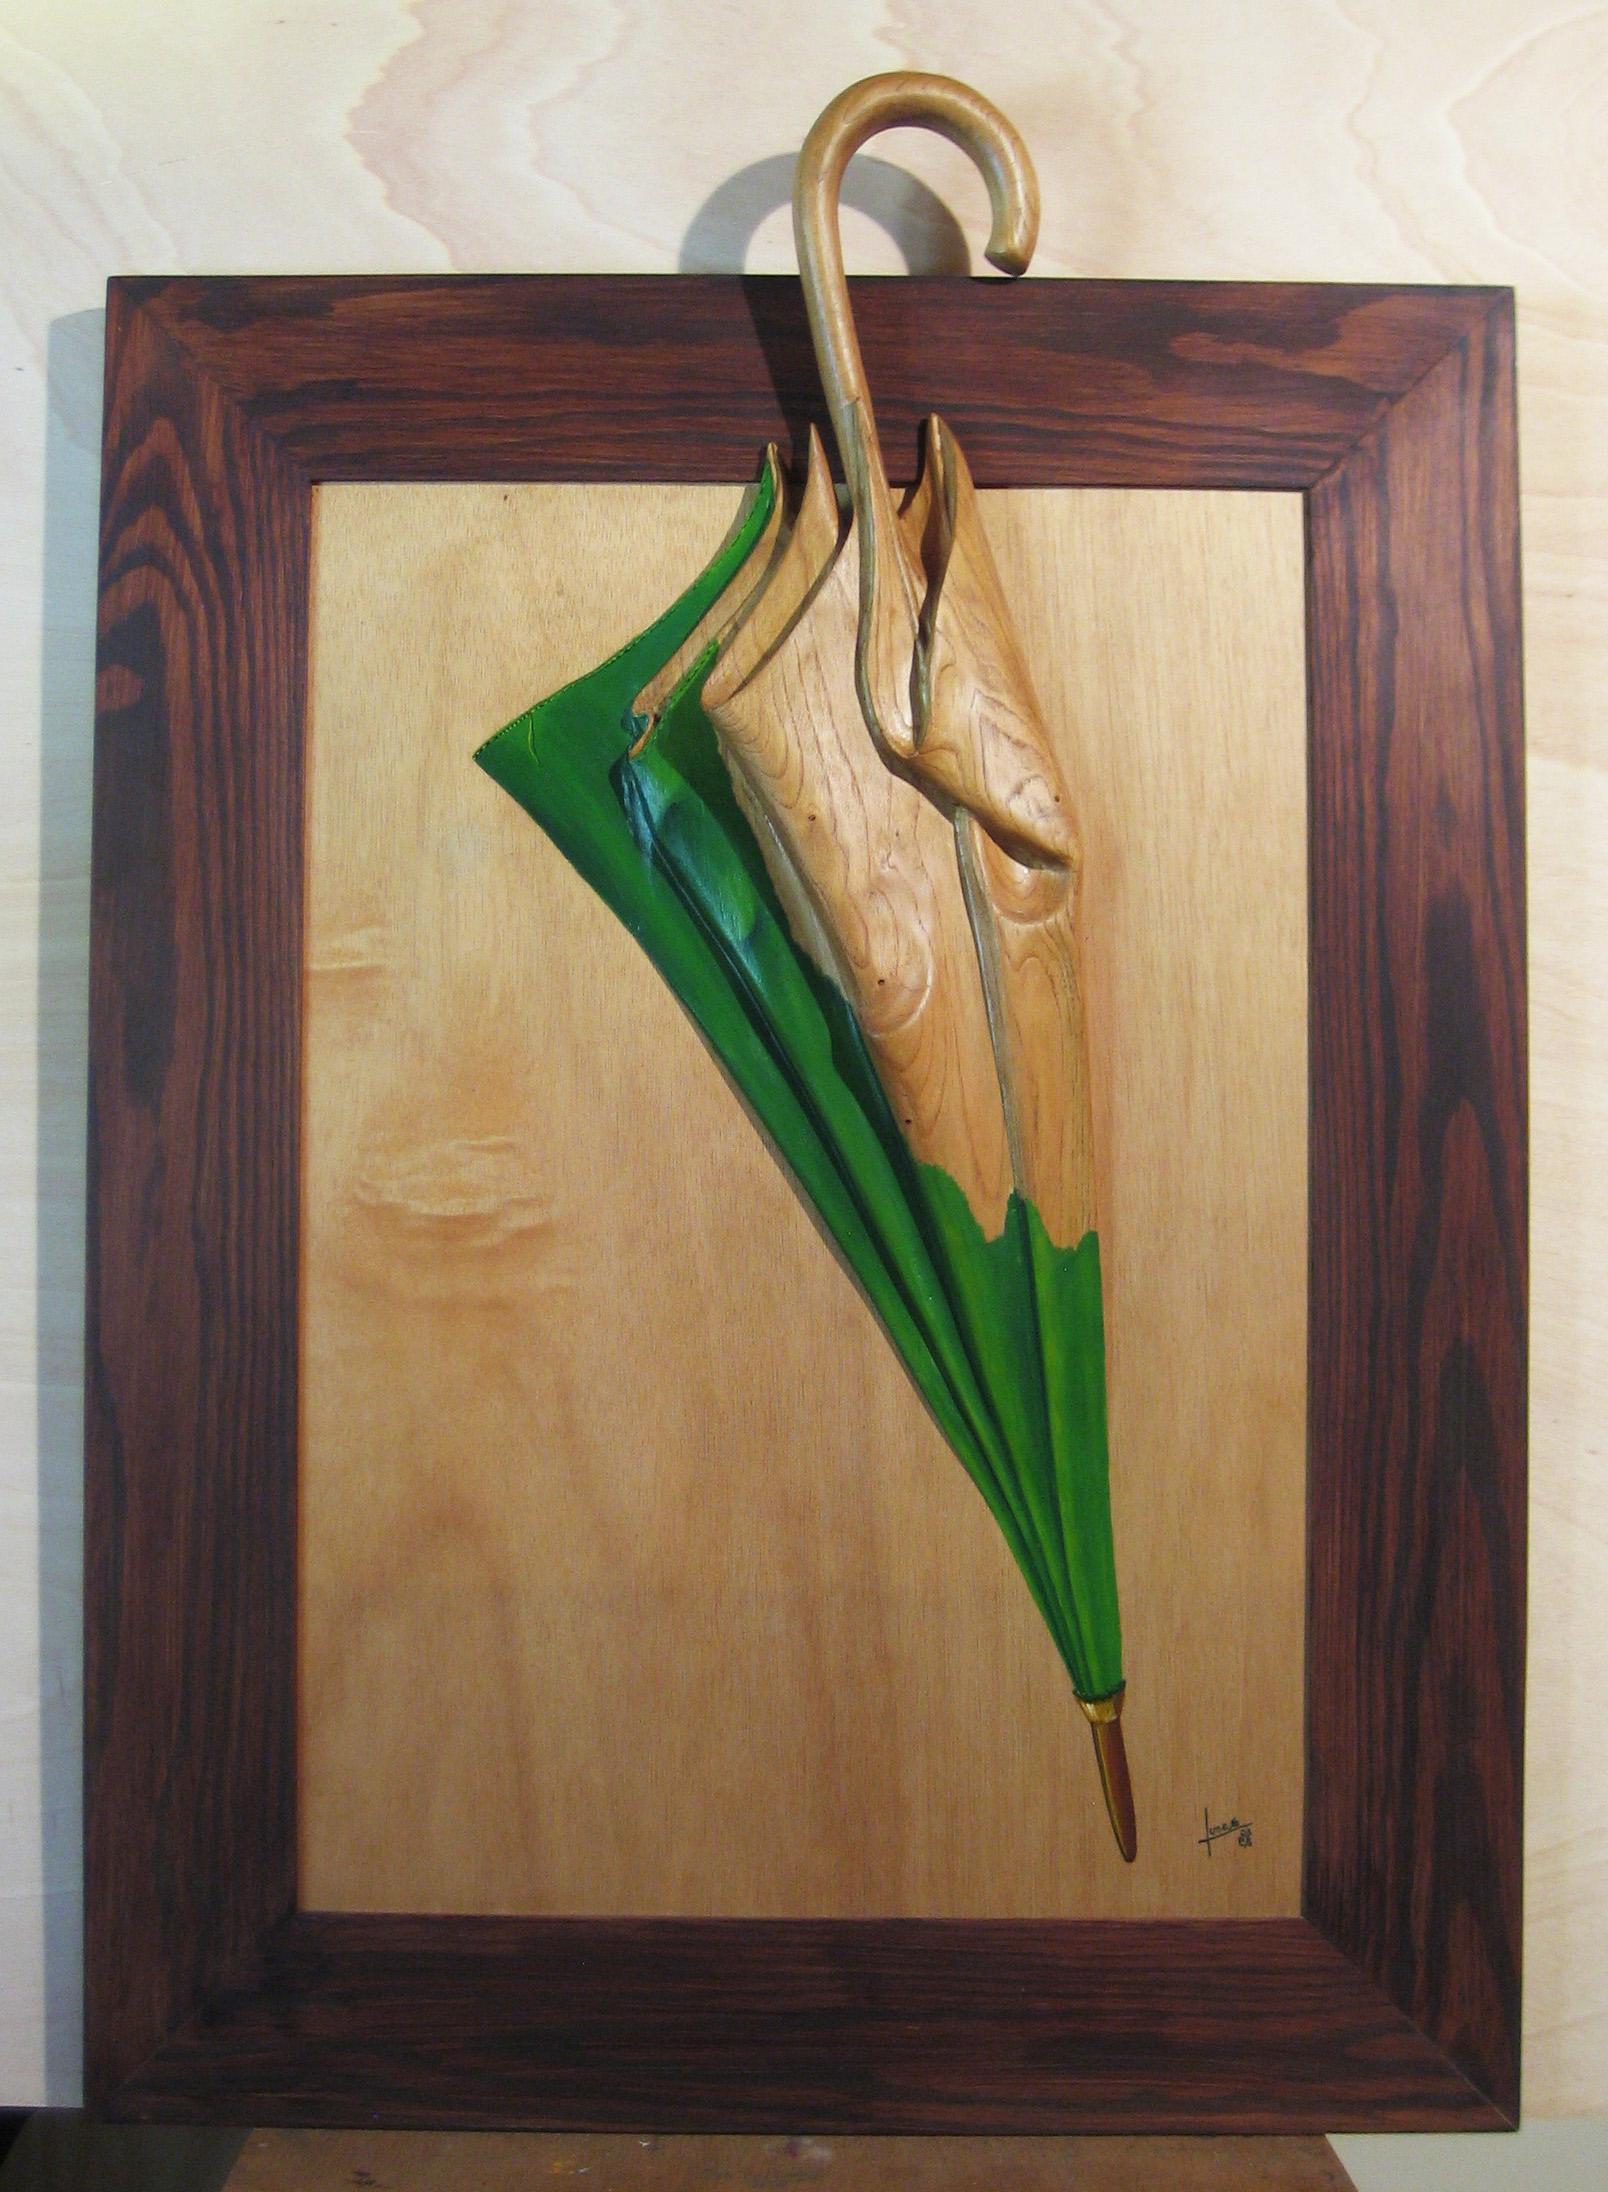 Bodeg n de paraguas pintura con relieve jorge jones - Pinturas de madera ...